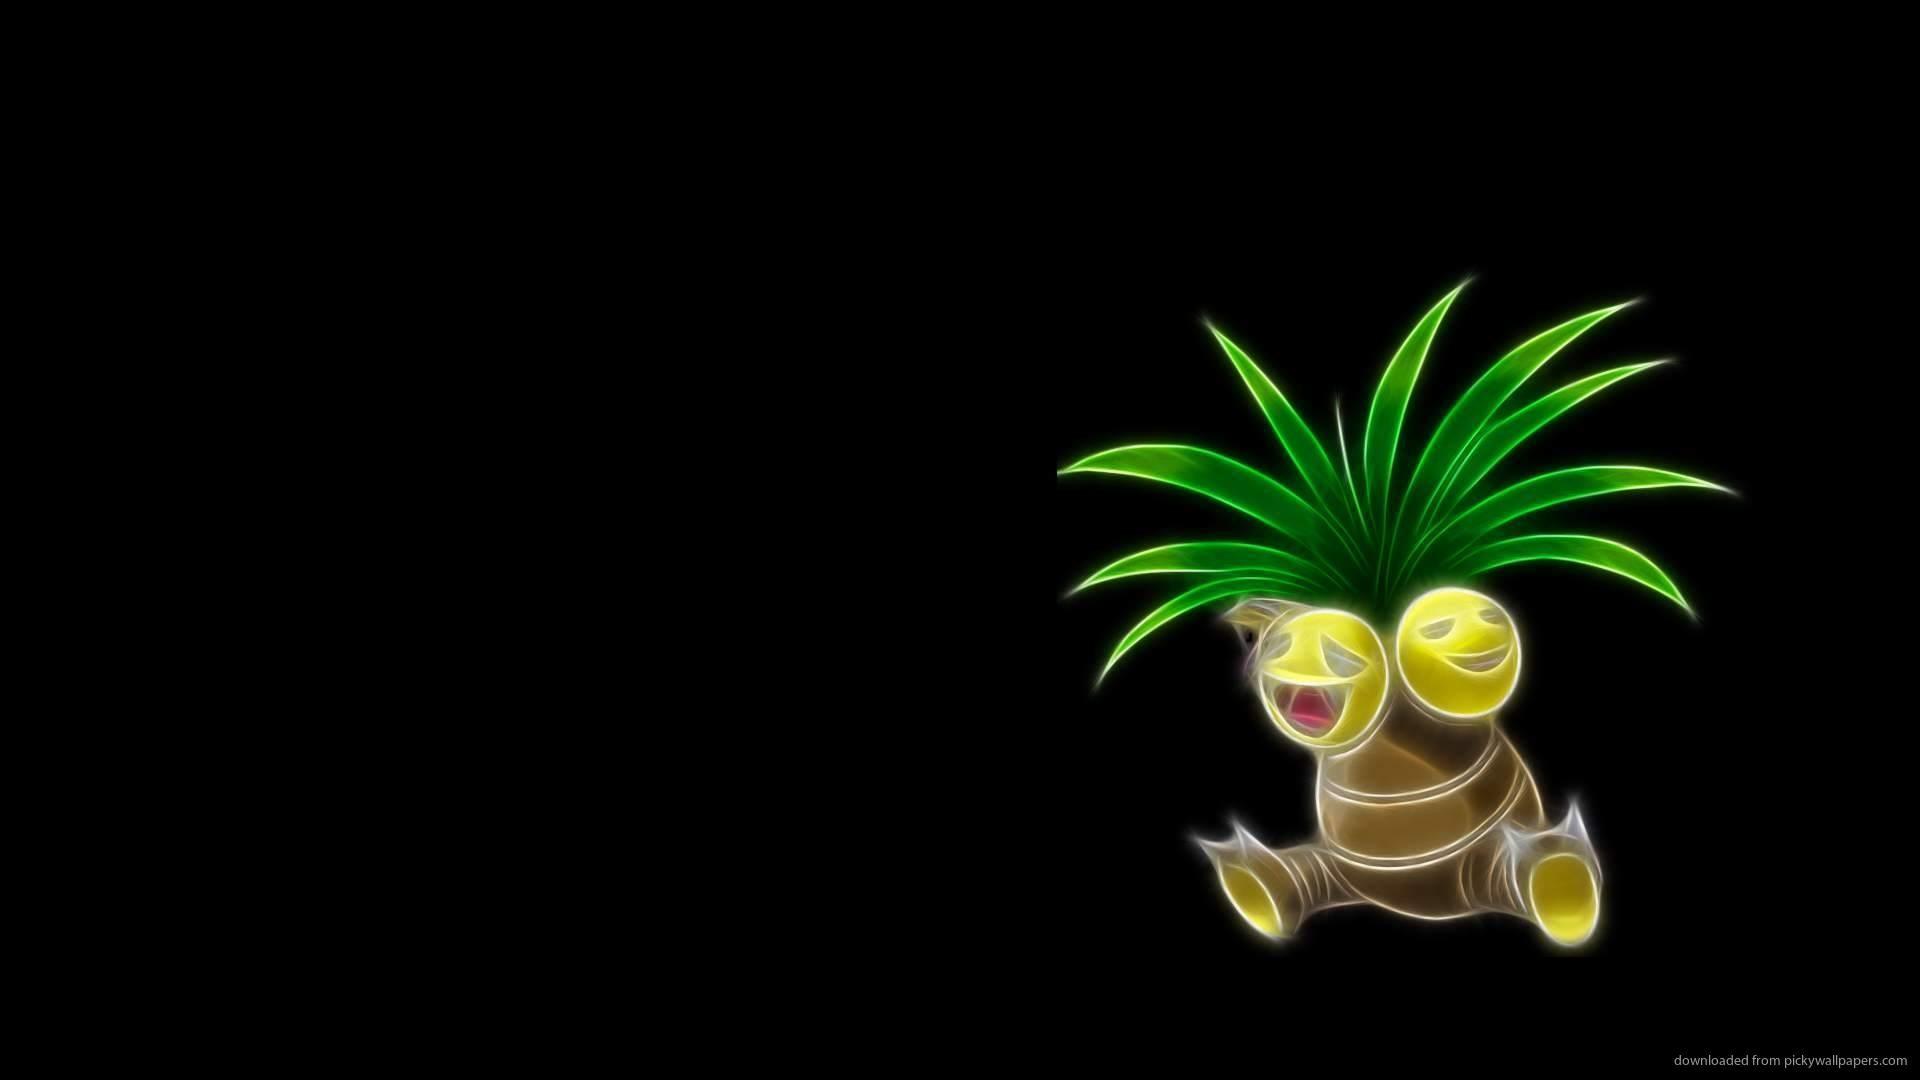 Exeggutor Pokemon Wallpaper picture